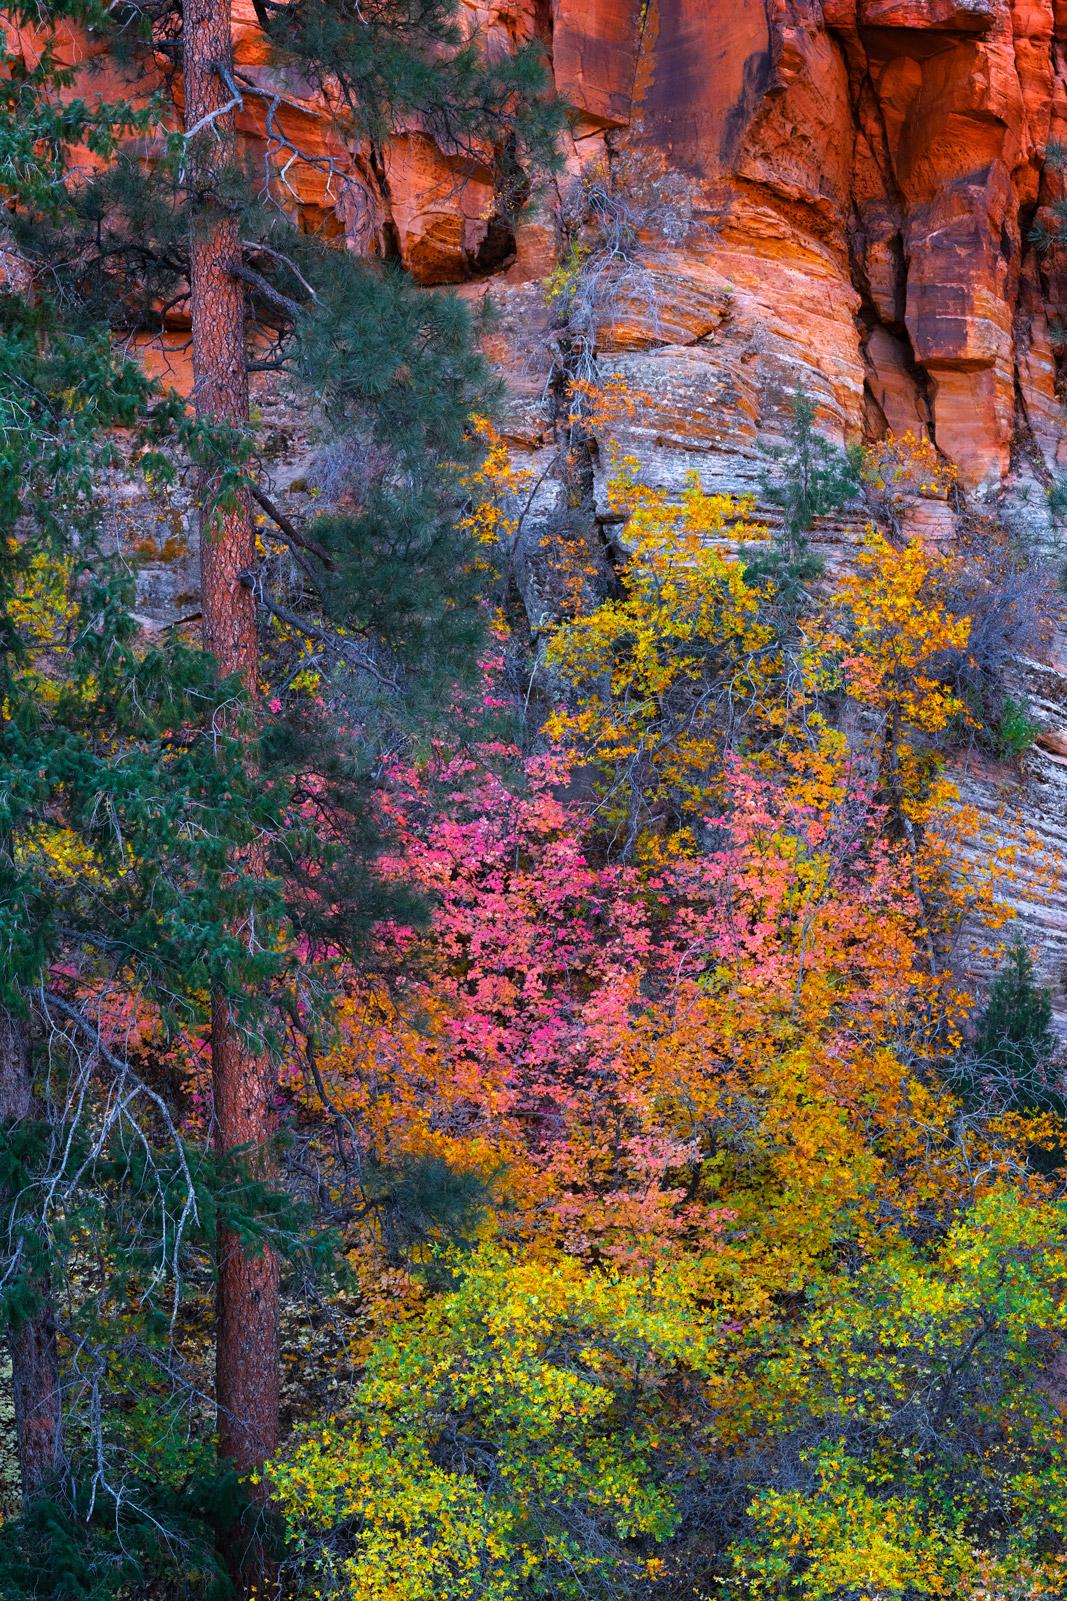 Utah, Zion, National Park, Fall, Color, Canyon, Surprise, Pine Trees, limited edition, photograph, fine art, landscape, photo